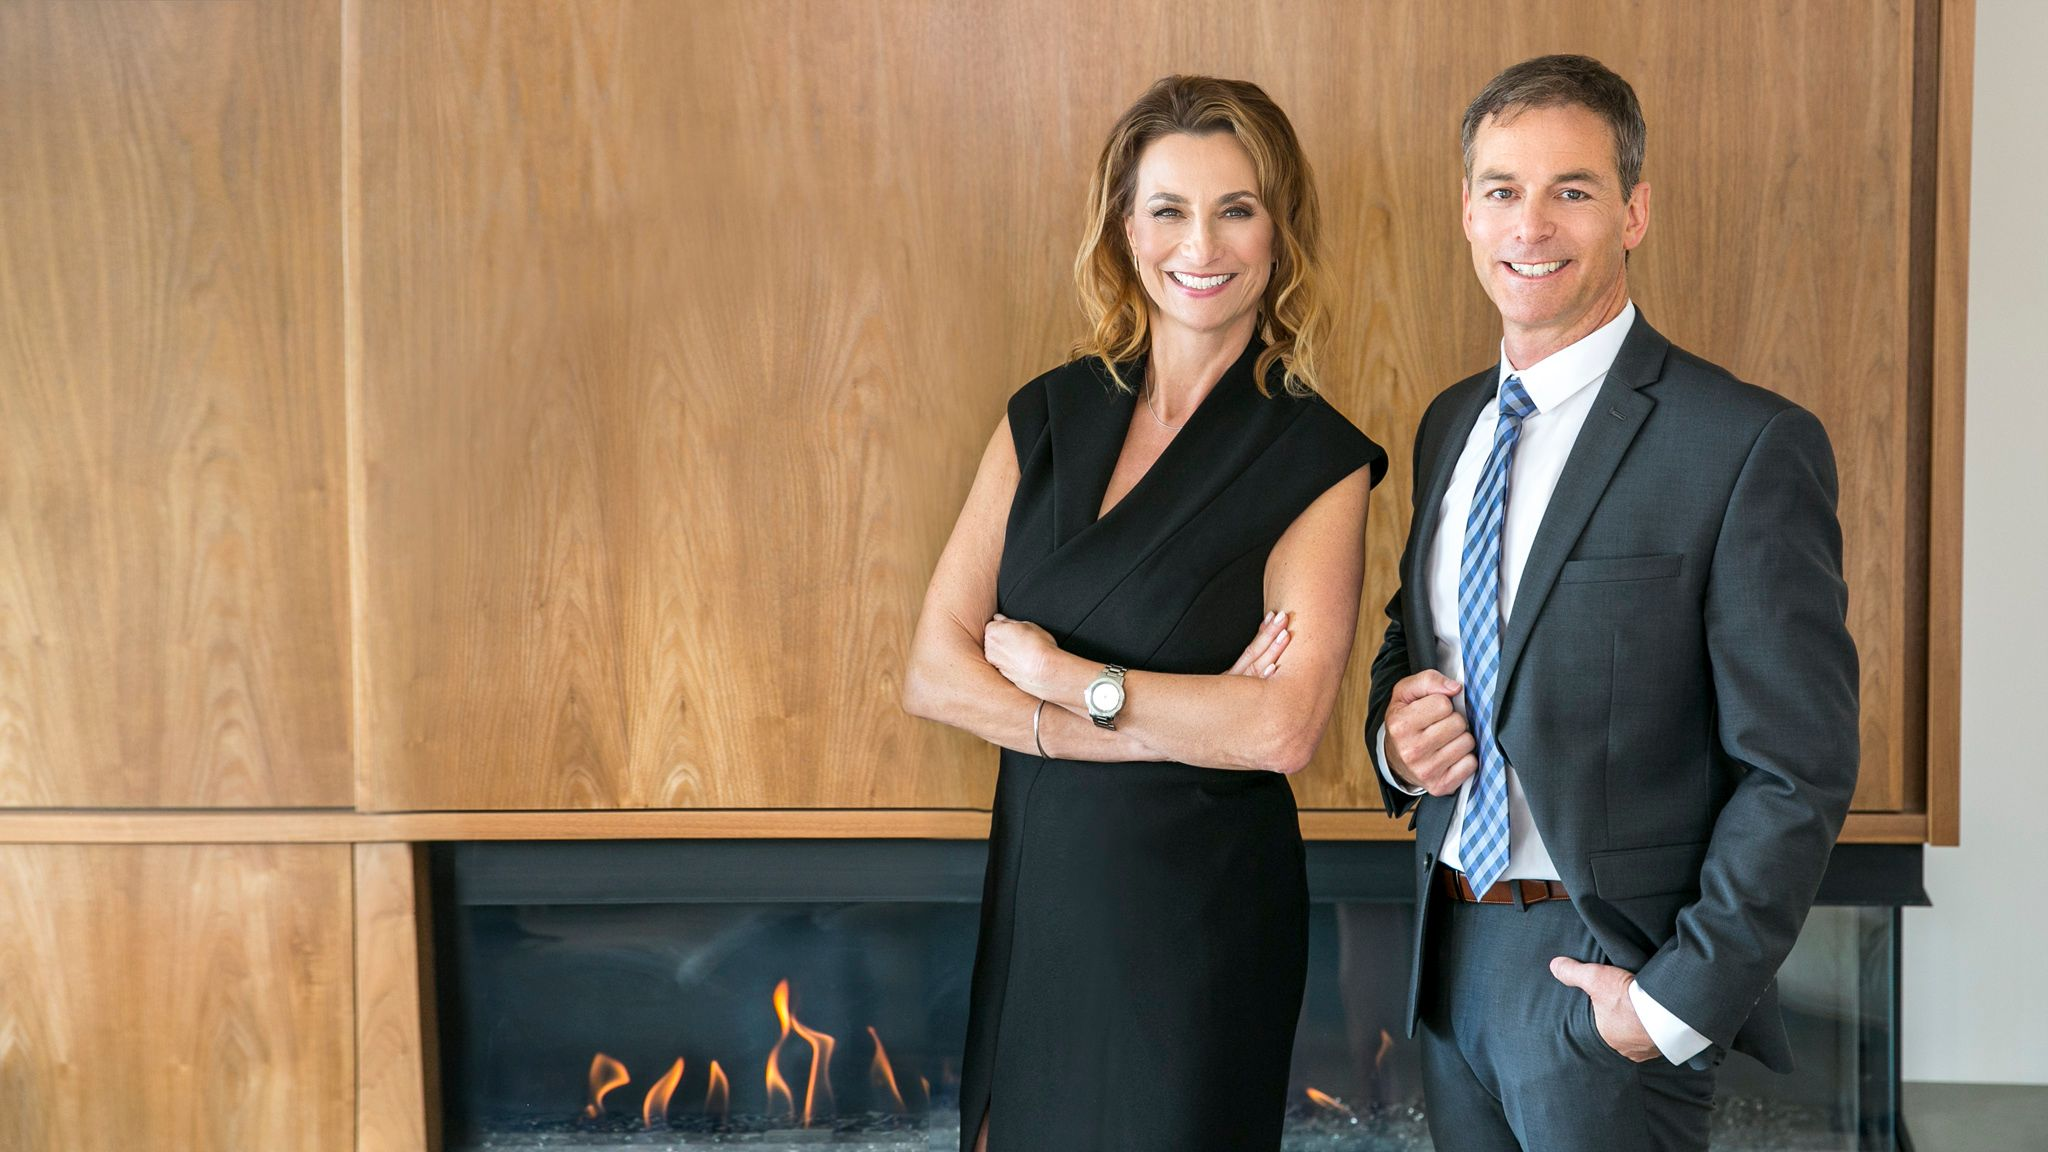 Klara Straus Henkels & Associates